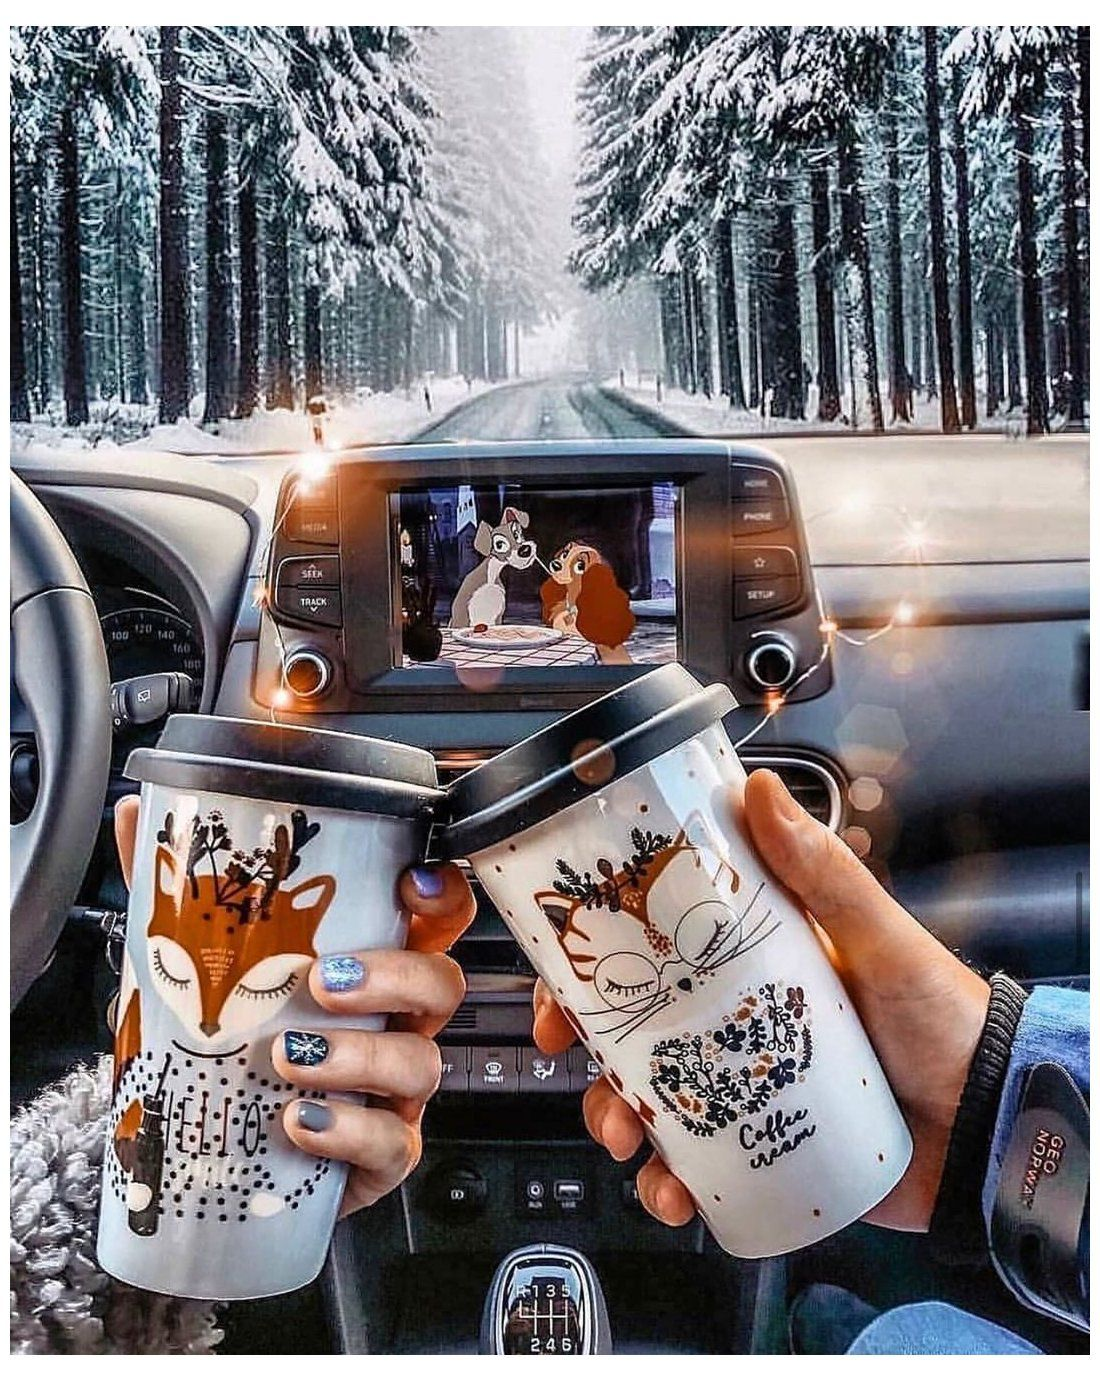 "Santa Claus on Instagram: ""108 DAYS LEFT UNTIL CHRISTMAS???????????????????? . . . . . #christmastime #christmasmood #ch Christmas vibes! #christmastime #christmasmood #christmasvibes #christmaslove  #christmaslights #lights…"""